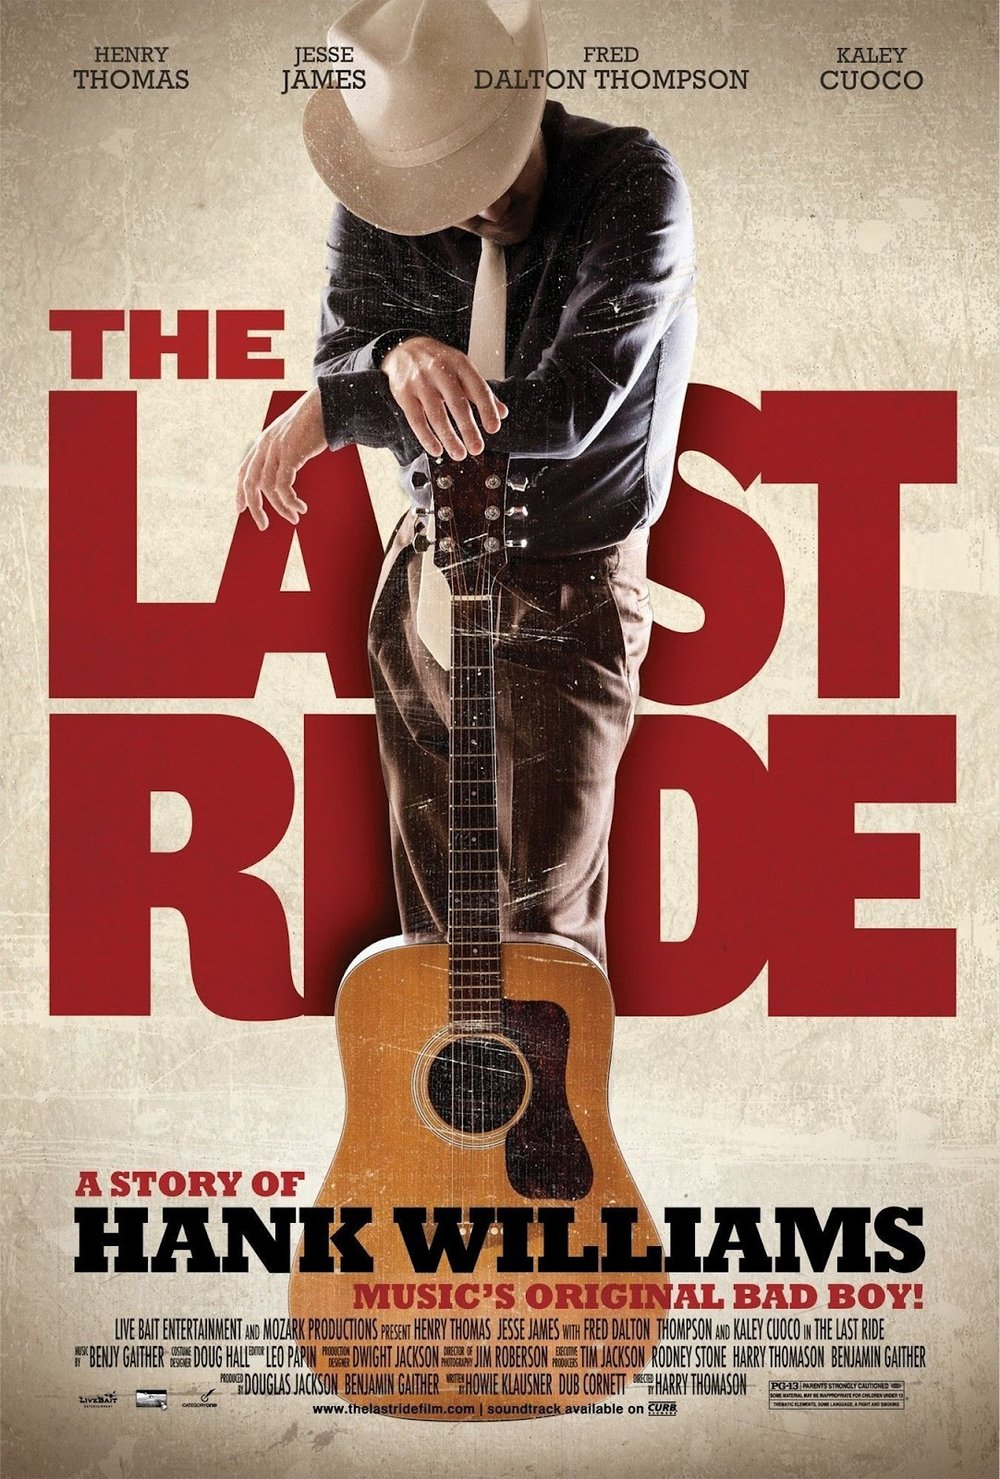 The-Last-Ride-Movie-New-Posters-Mycineworld-Com.jpg